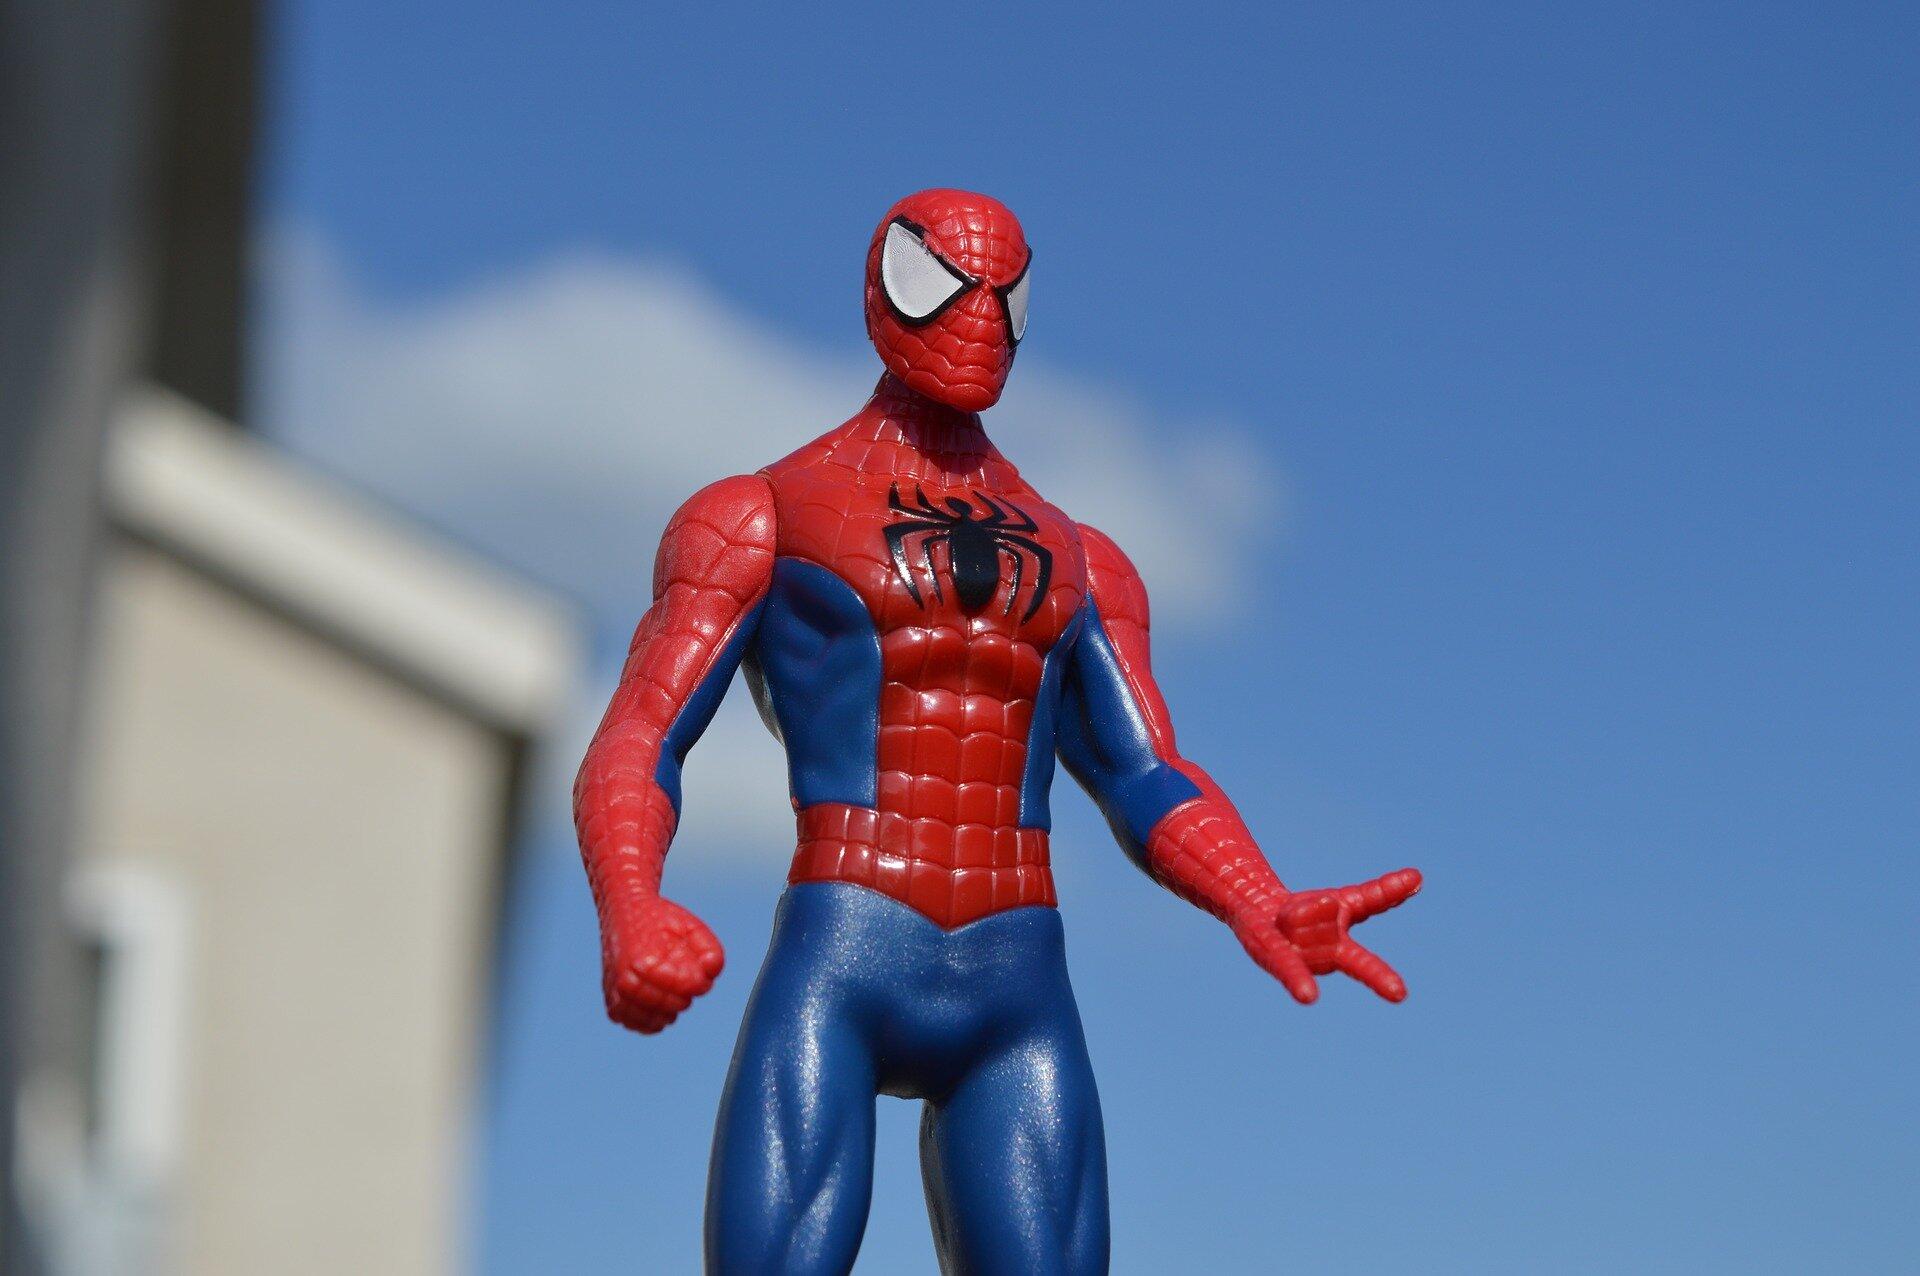 spiderman-1560337_1920.jpg